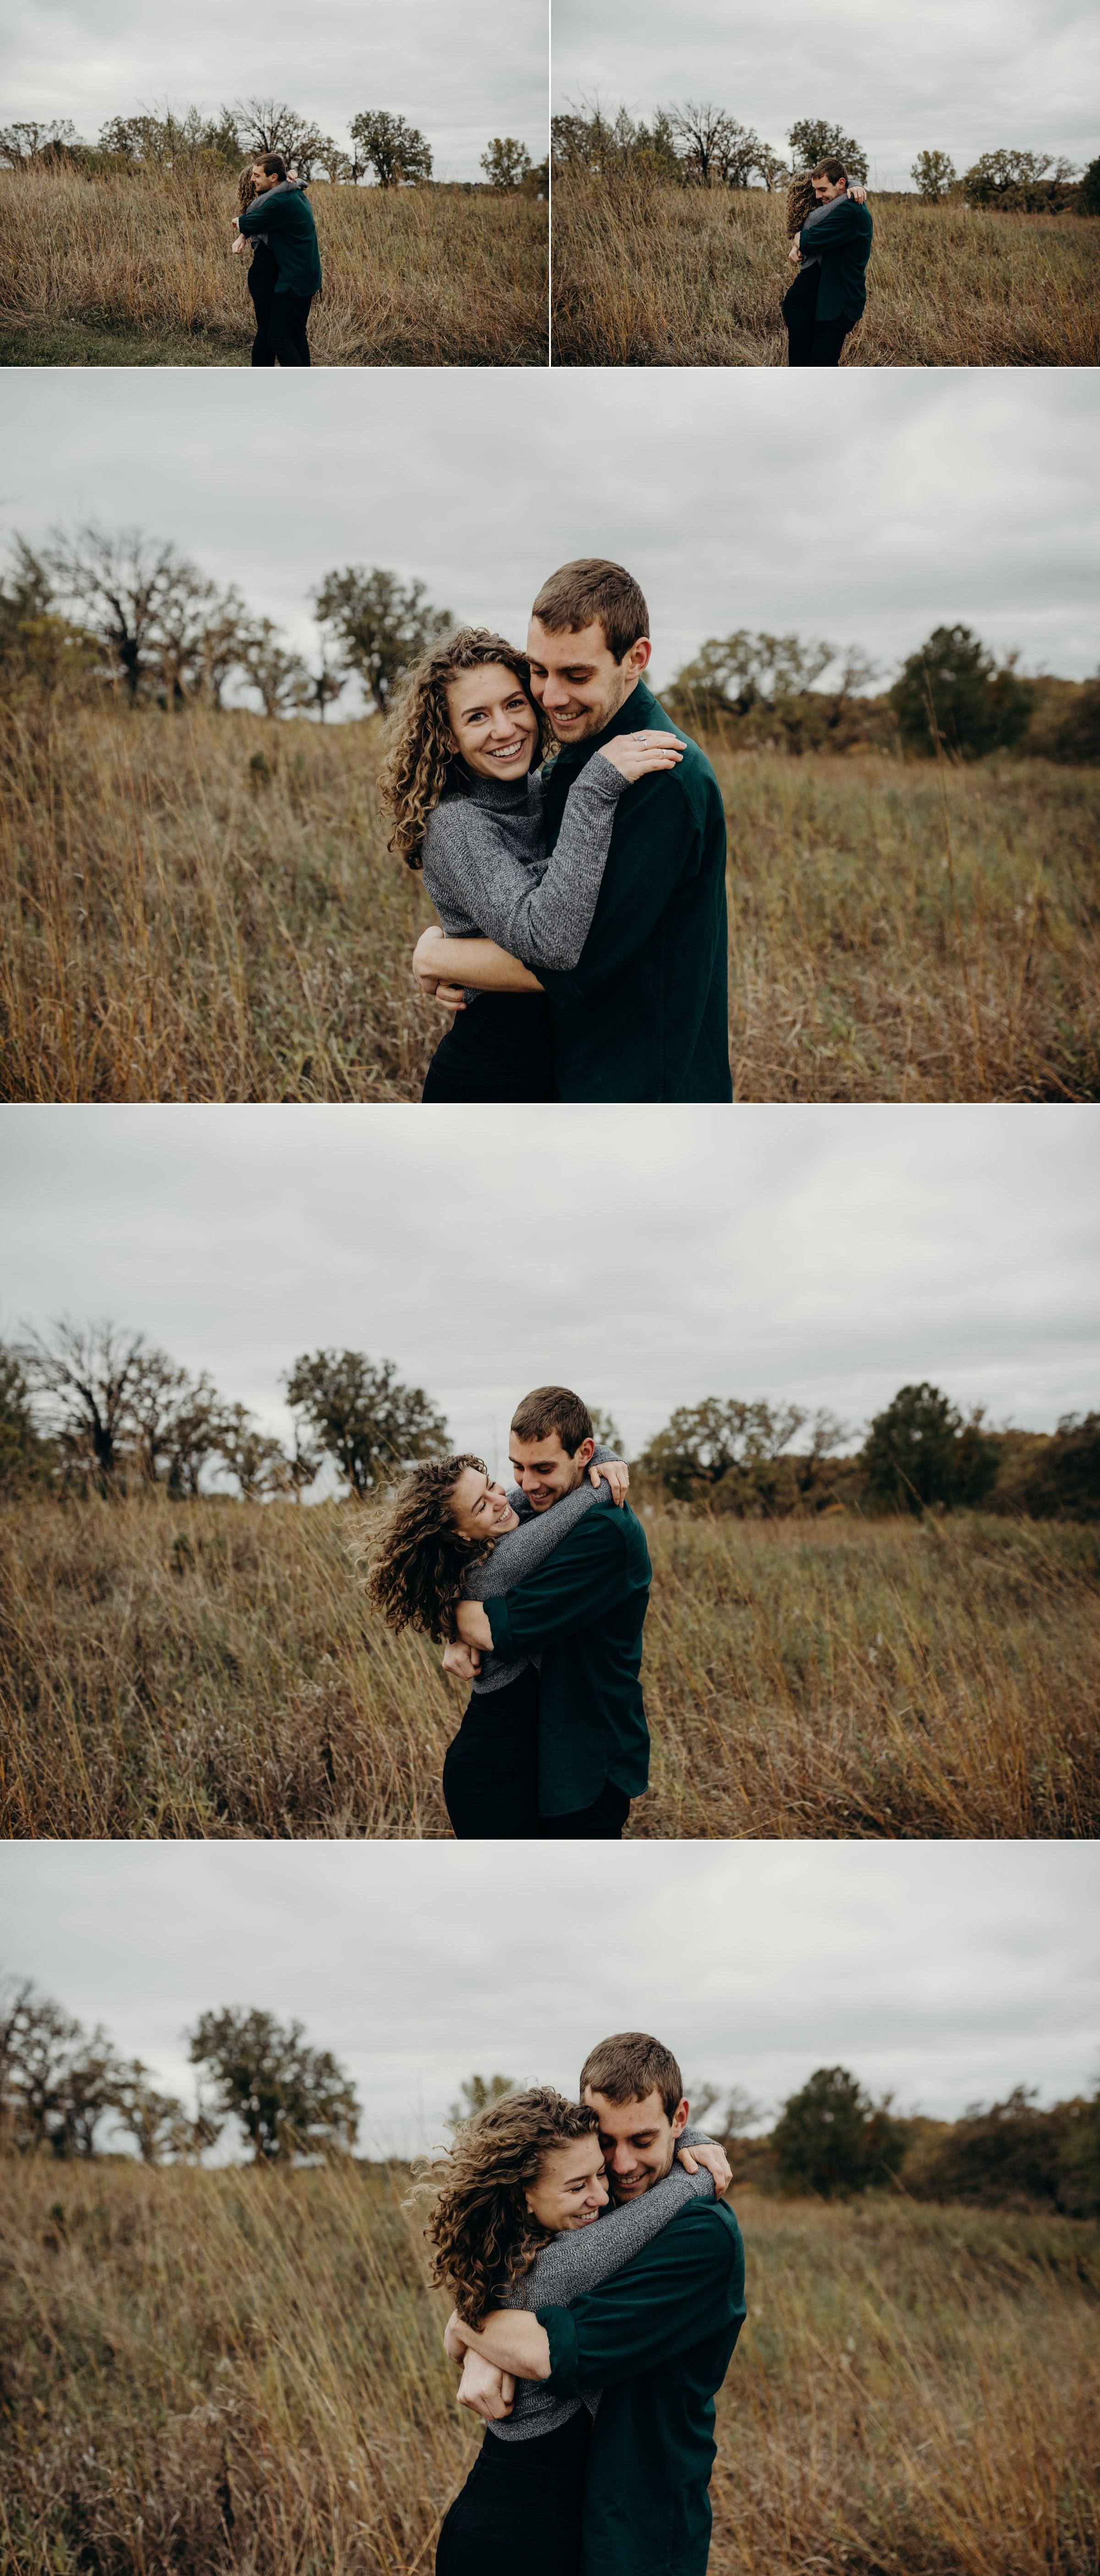 nickmezaphotography-austin-minneapolis-wedding-photographer-elopement-best-intimate-adventurous-destination-texas-minnesota-engagement-jess-dan-spacesaver_0160.jpg